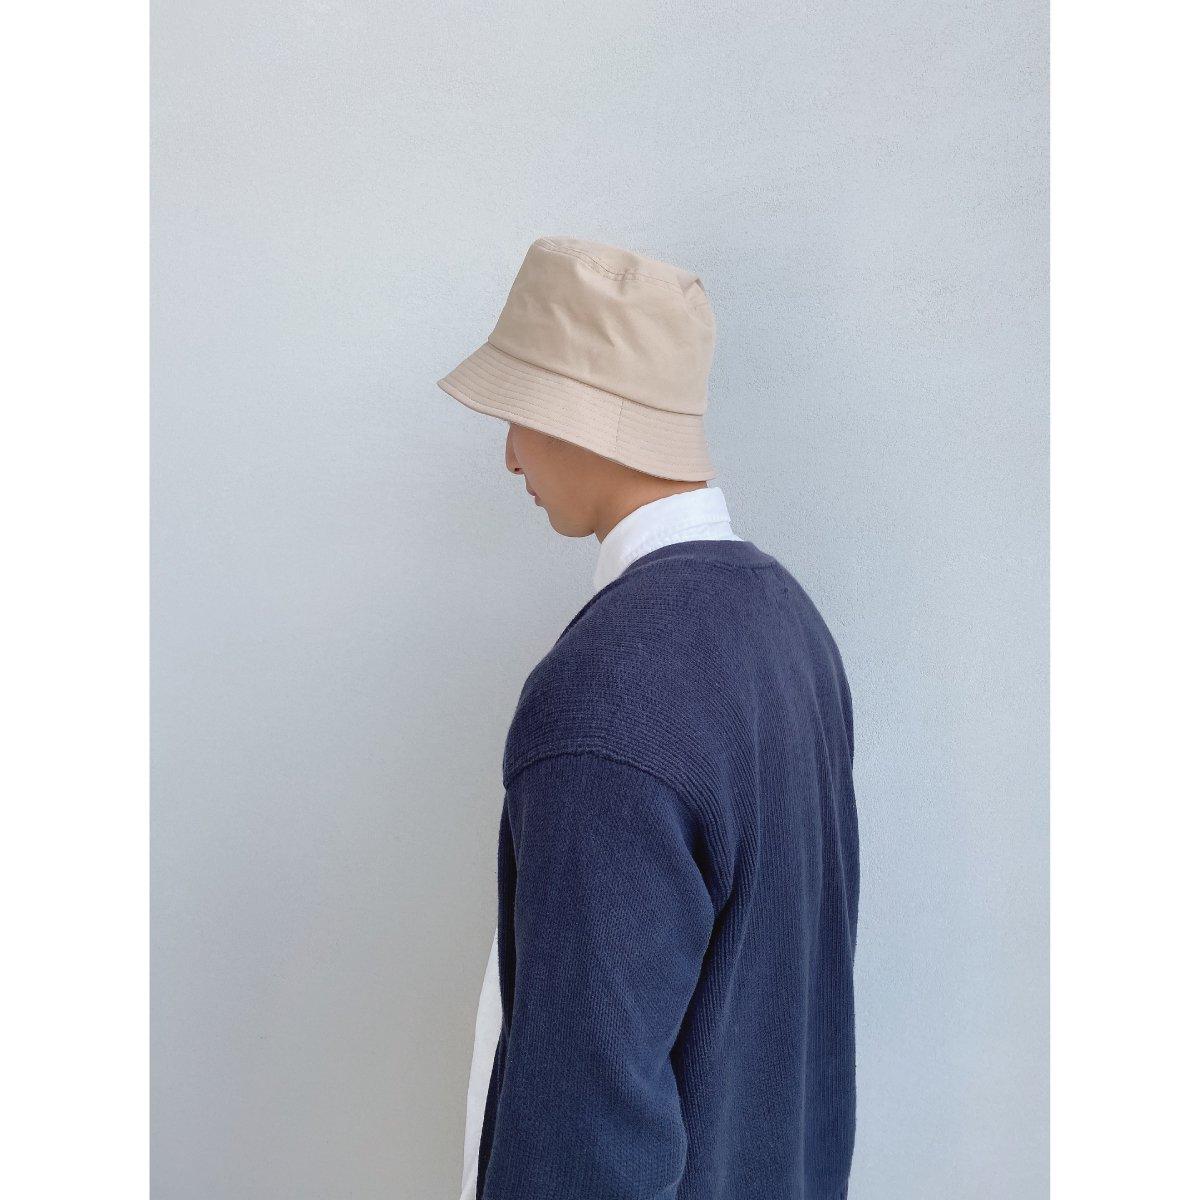 Genius BK Hat 詳細画像20